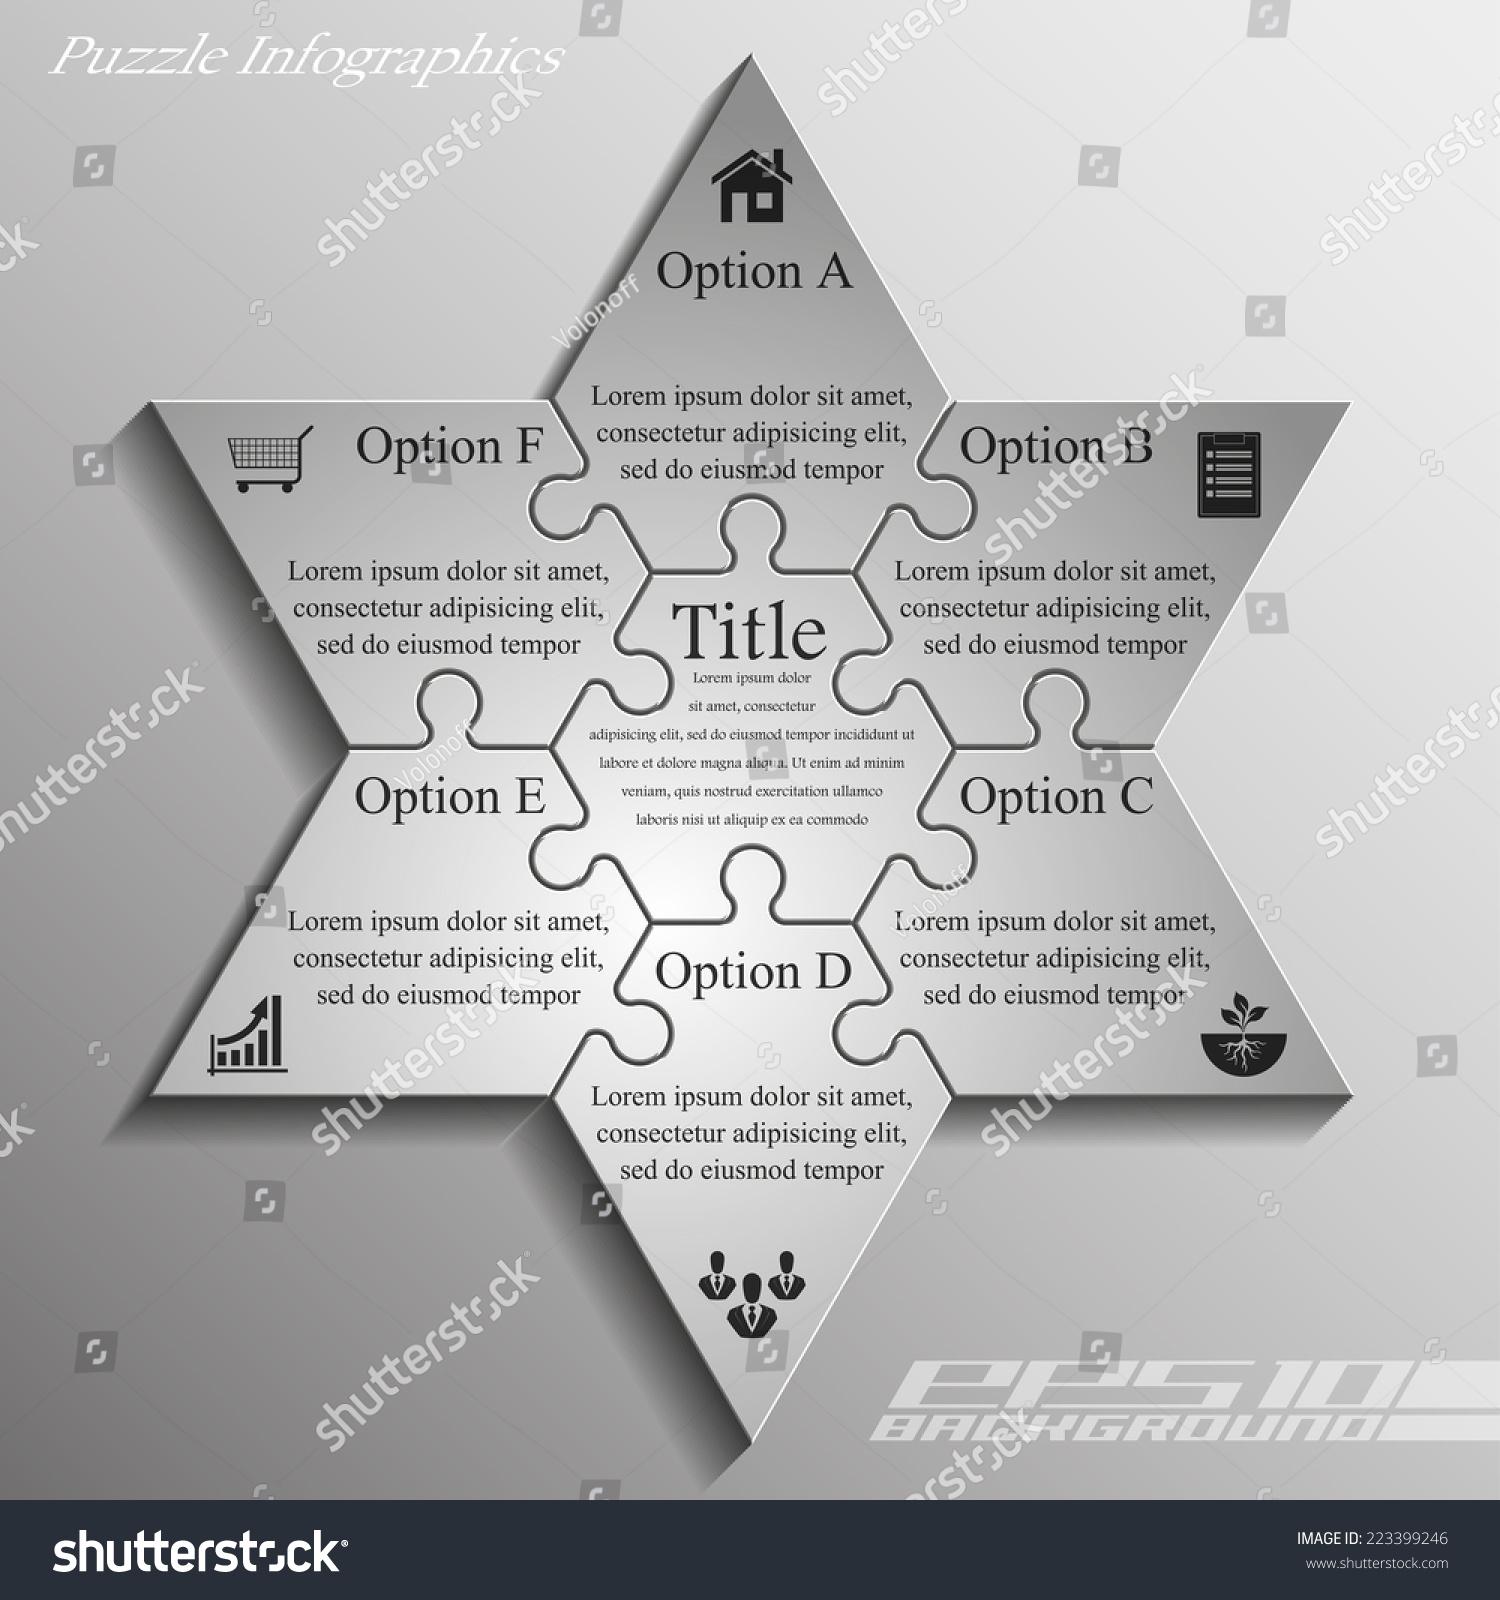 Star David Six Piece Flat Puzzle Stock Vector 223399246 - Shutterstock